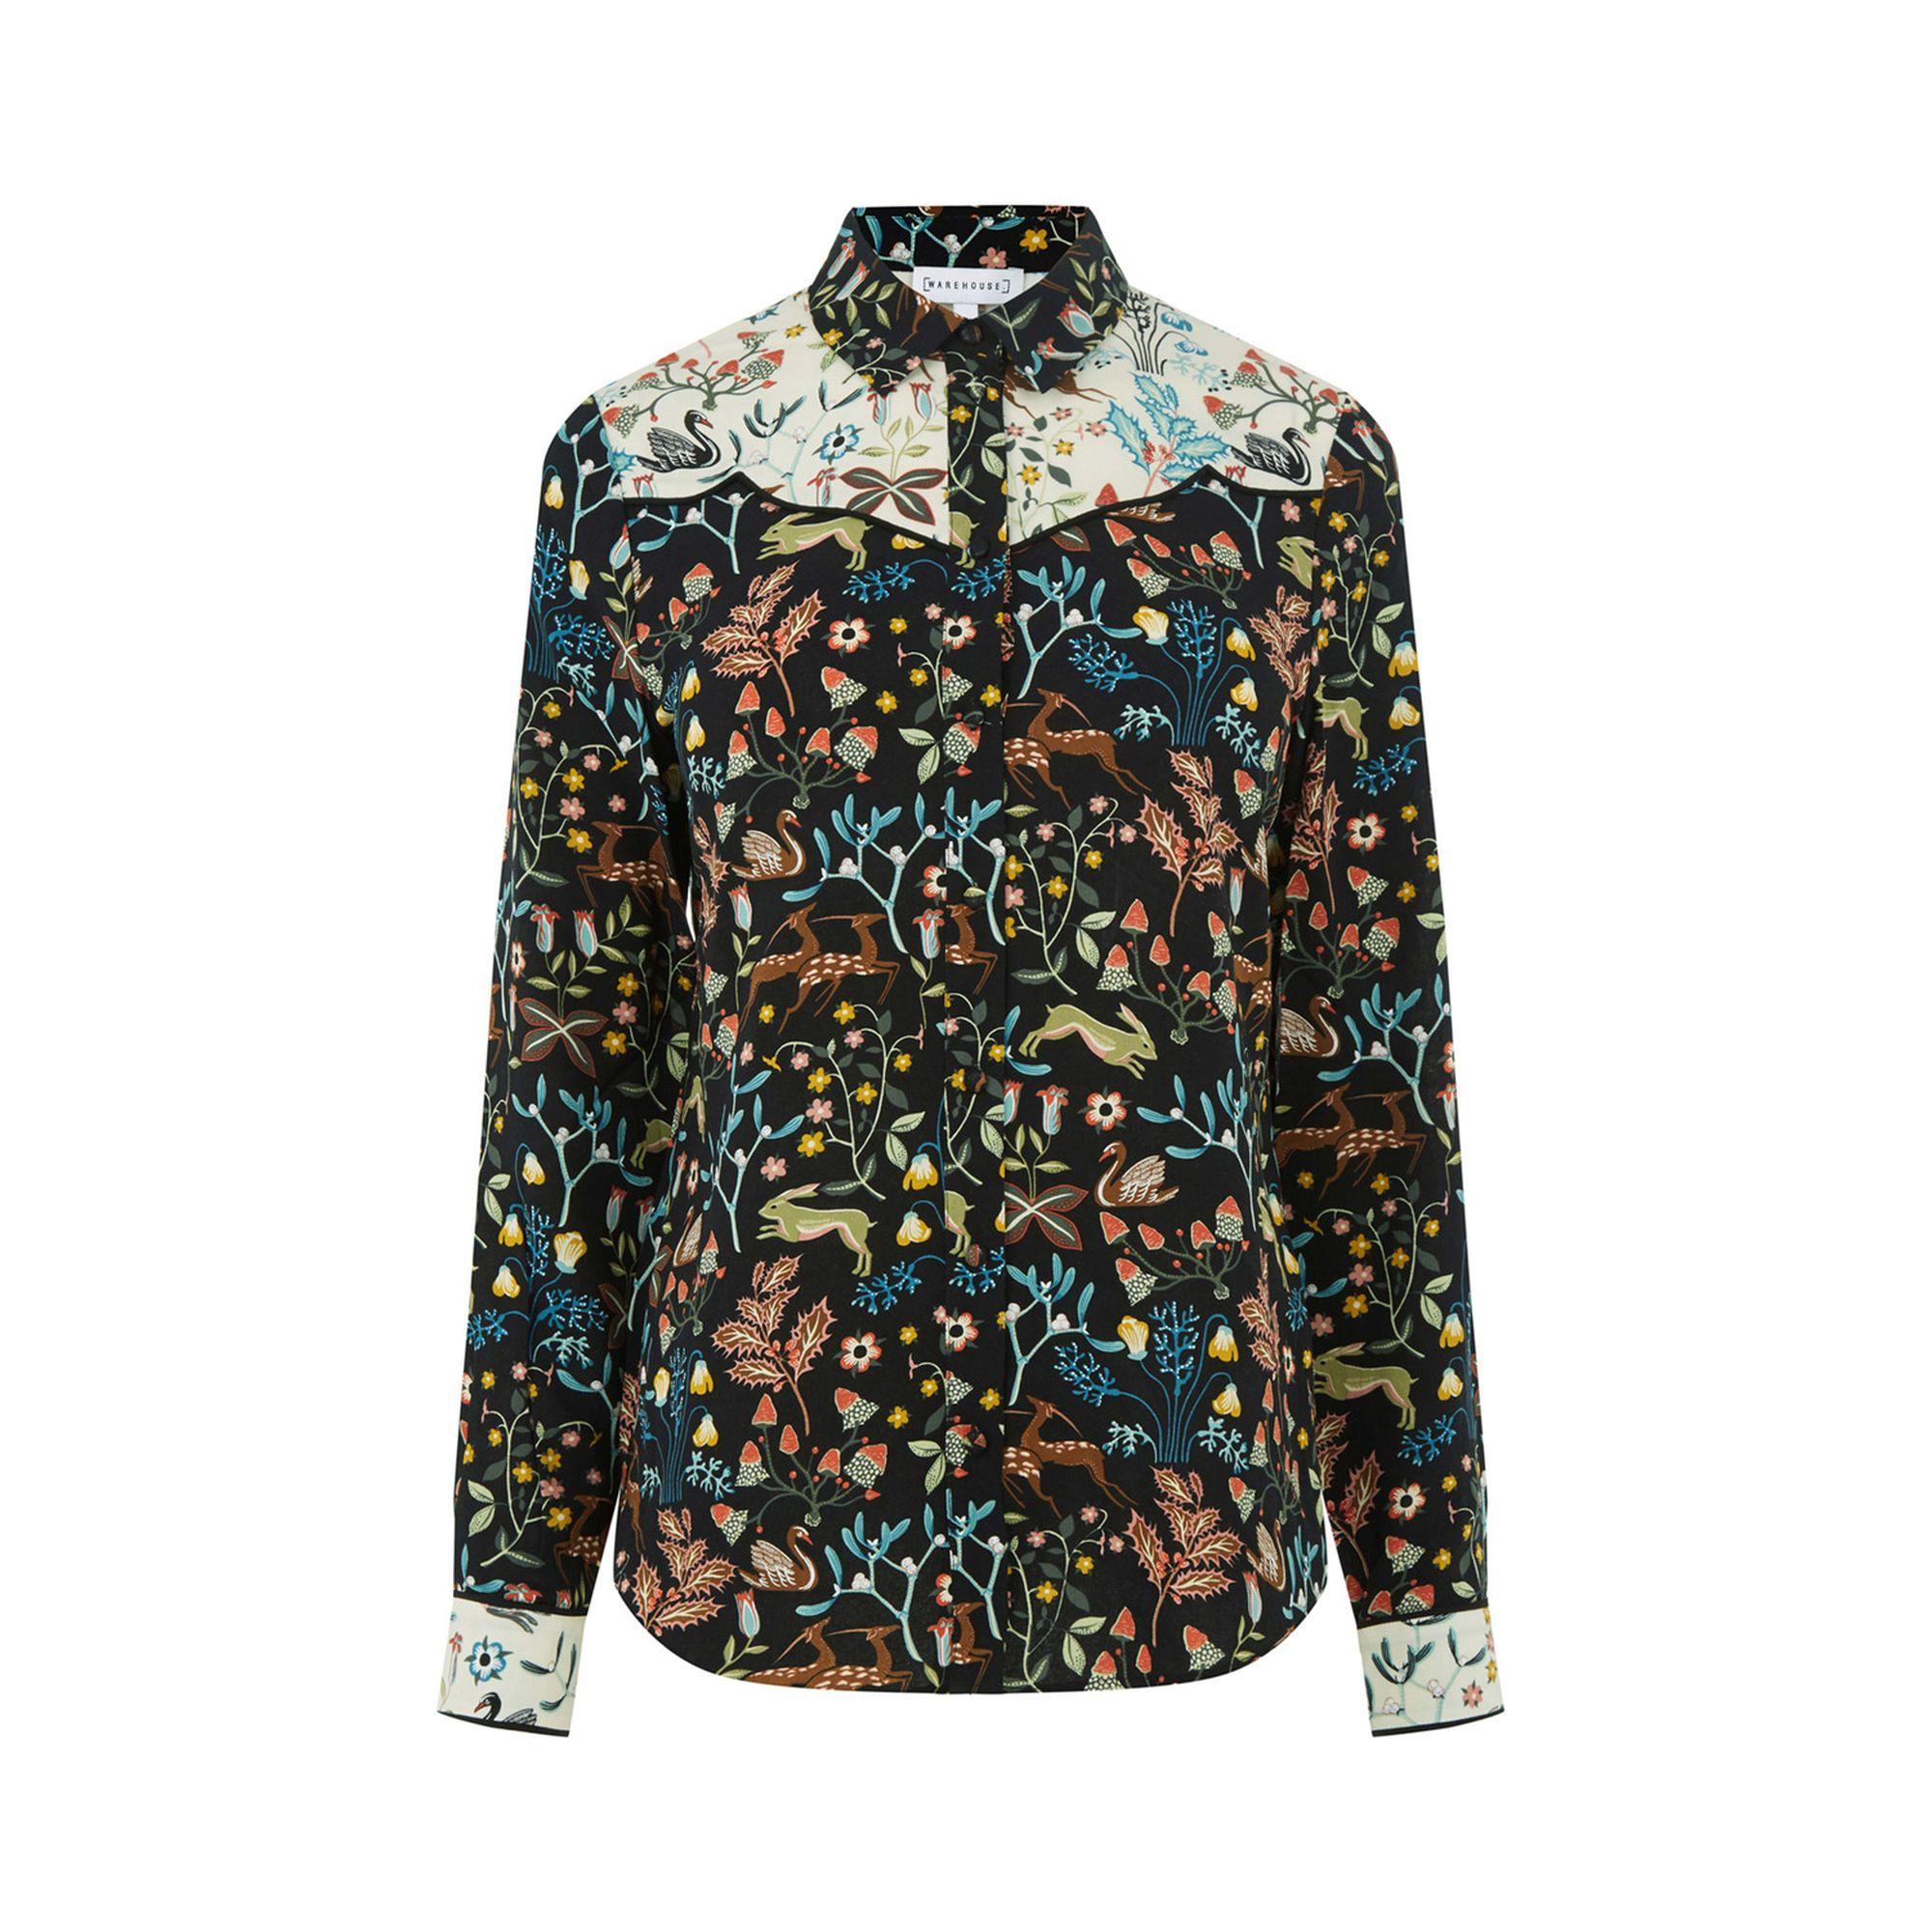 Thistle Print Western Shirt Warehouse Shirts Western Shirts Shirt Collar Pattern